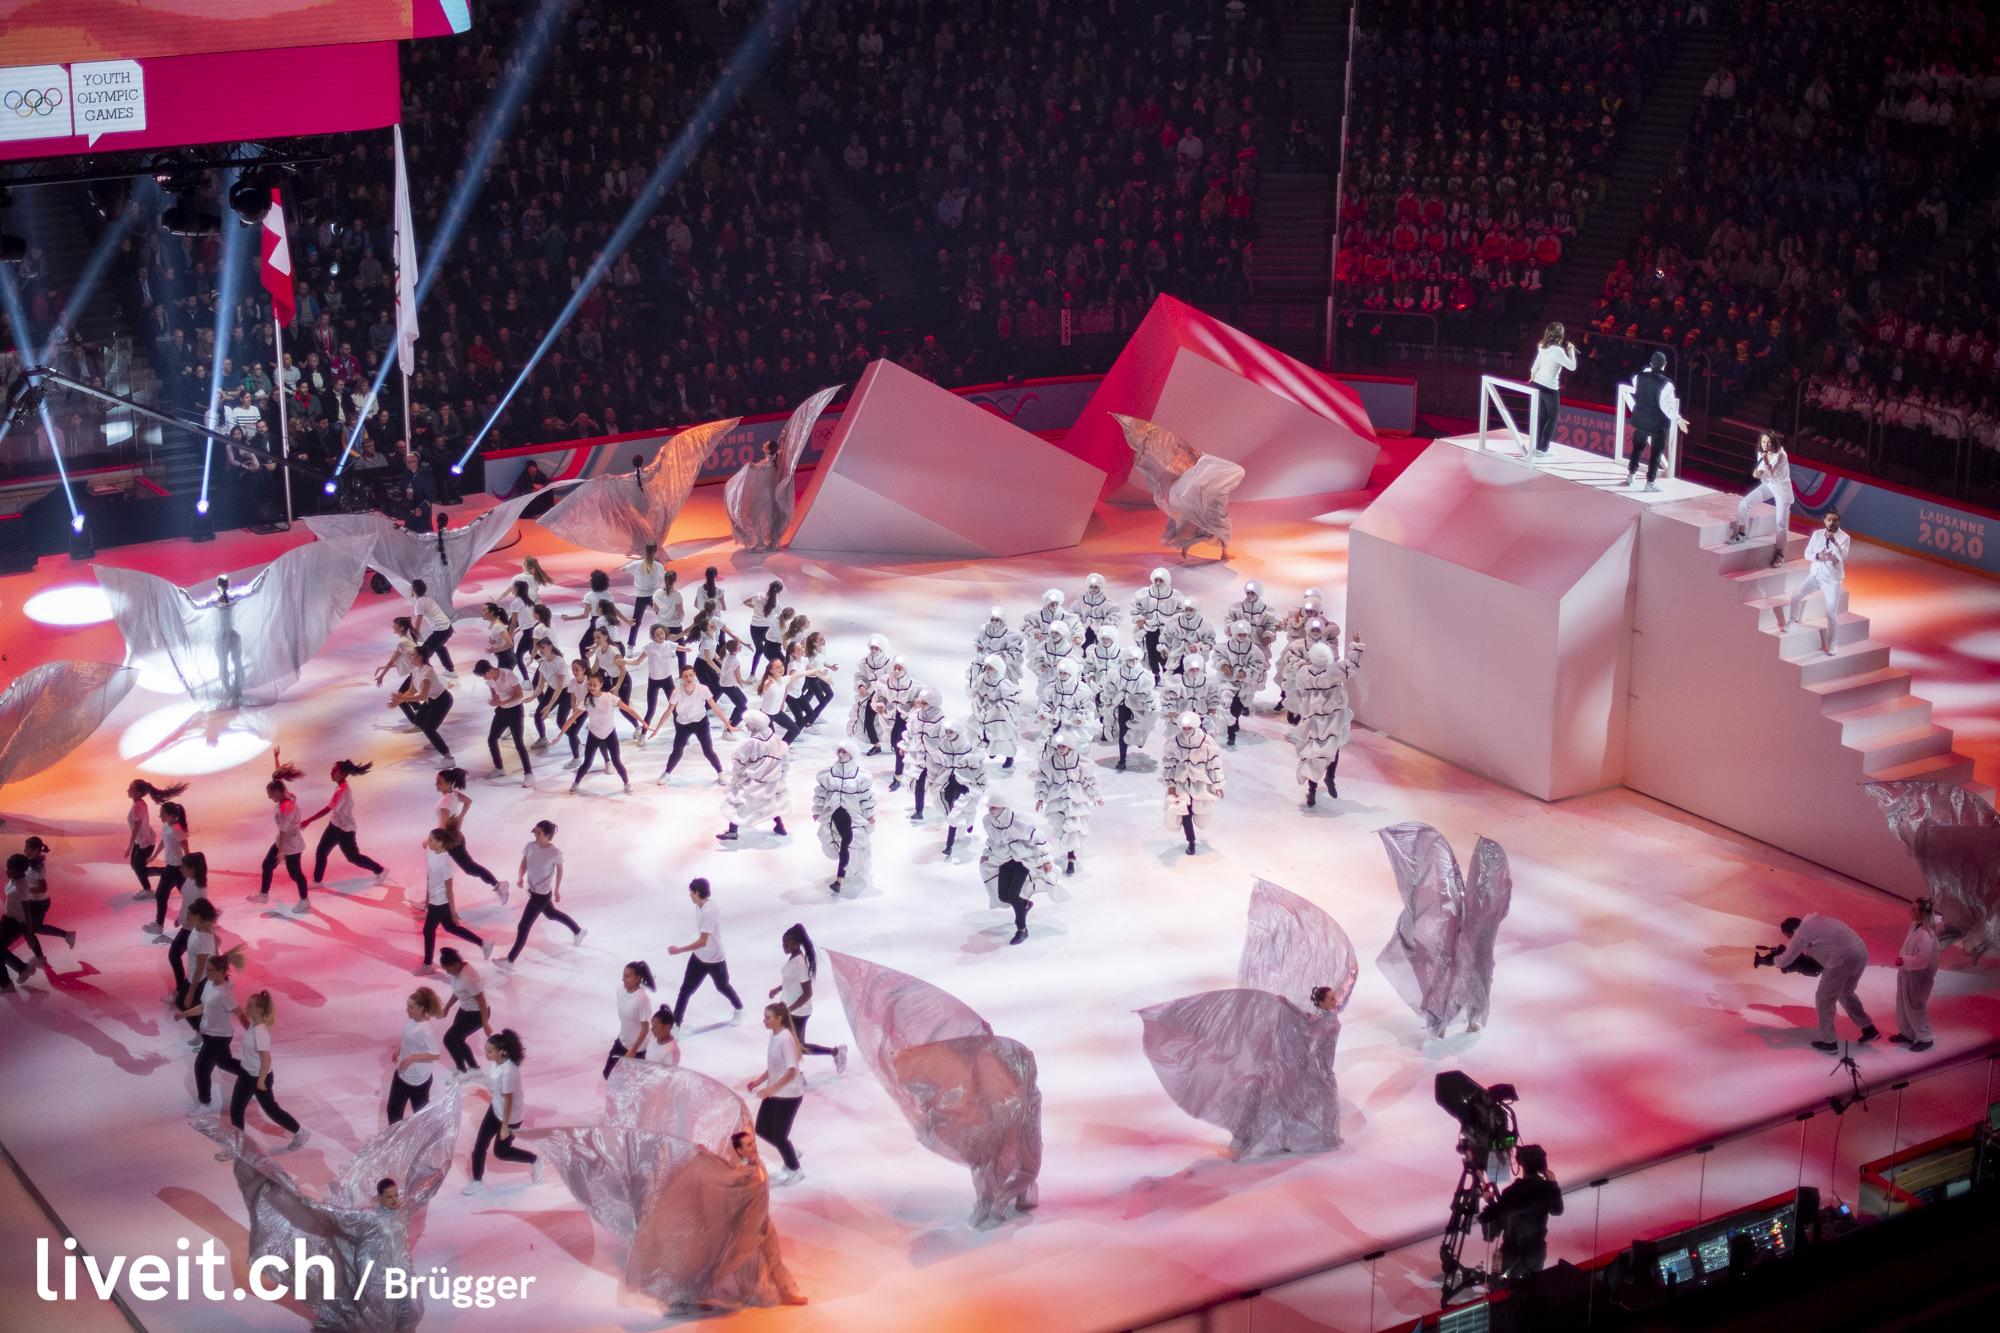 SWITZERLAND YOG LAUSANNE 2020 OPENING CEREMONY